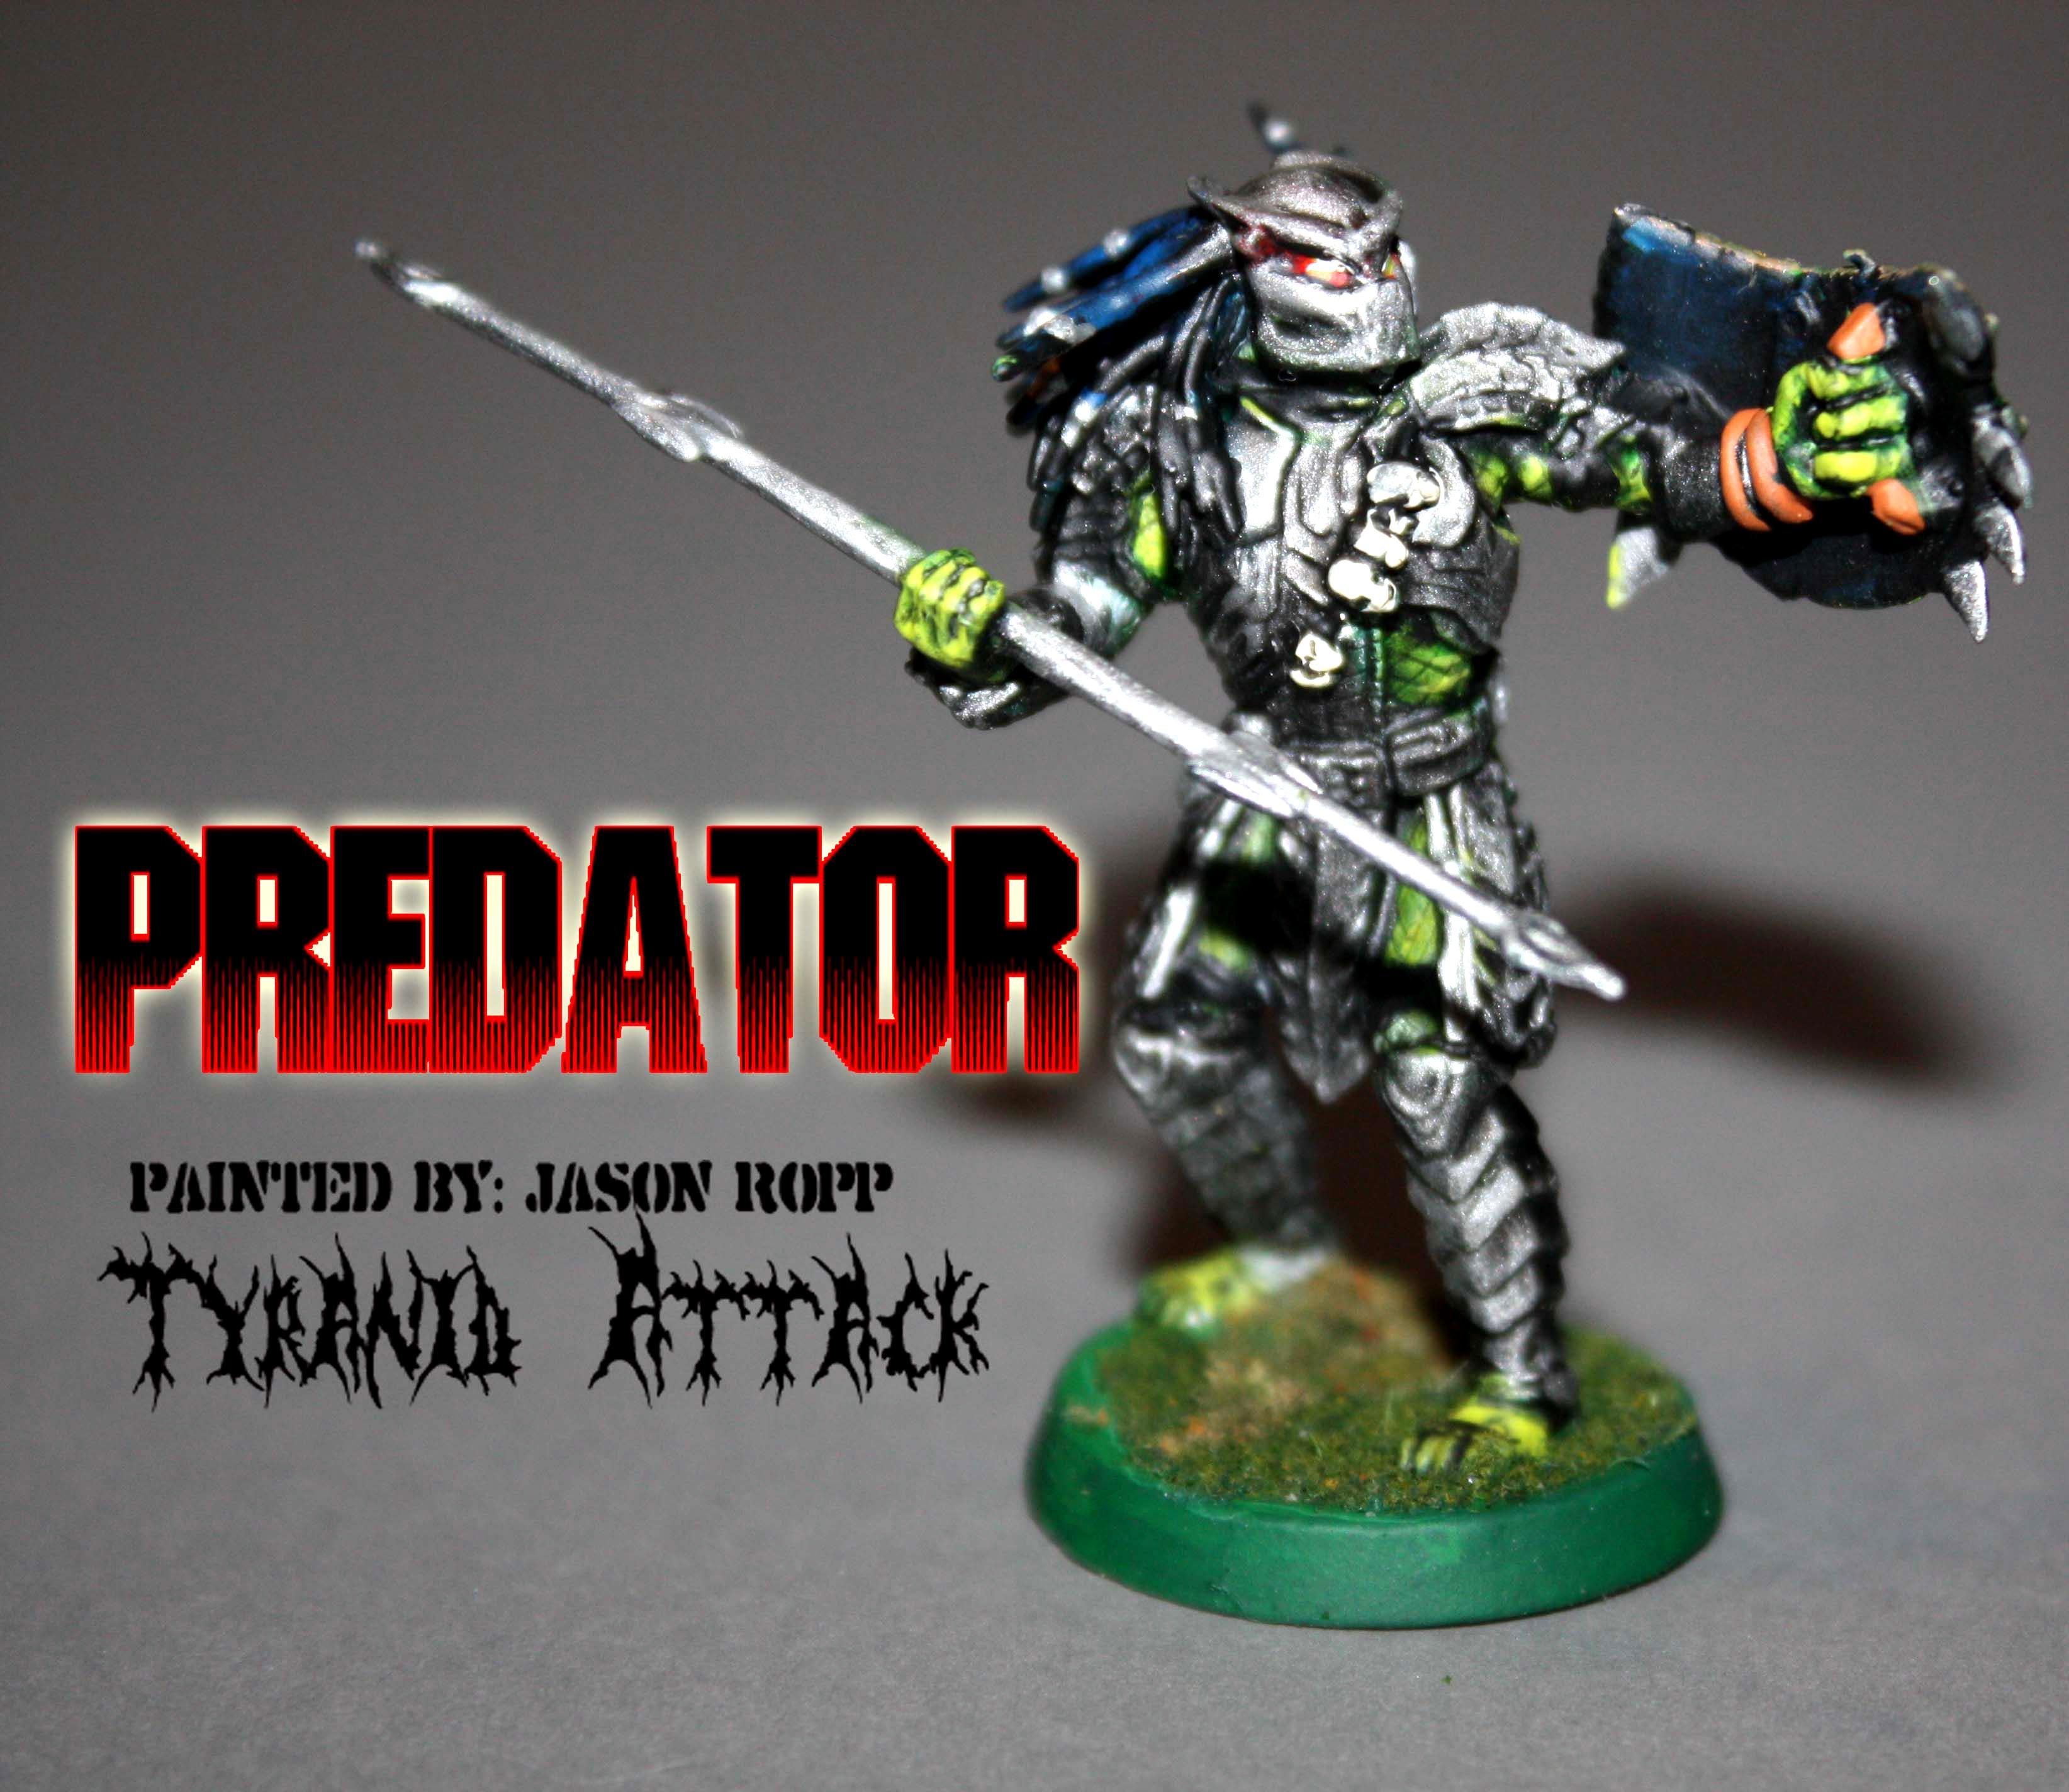 Aliens, Avp, Game, Heroclix, Miniature, Predator, Tyranid Attack, Vs